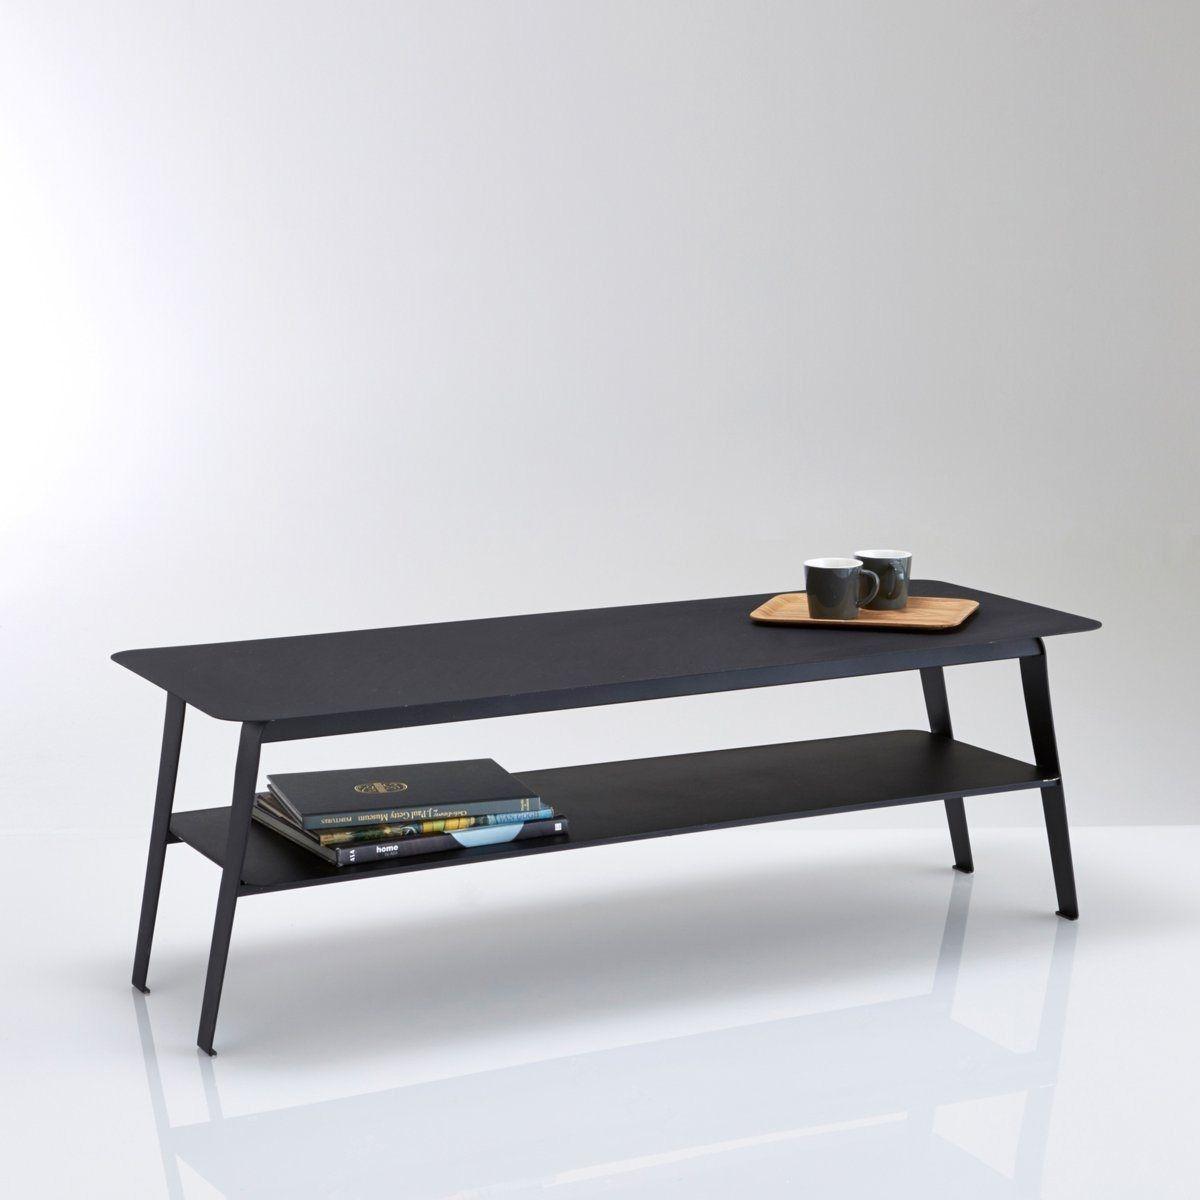 La Redoute Table basse double 69478ed538fd